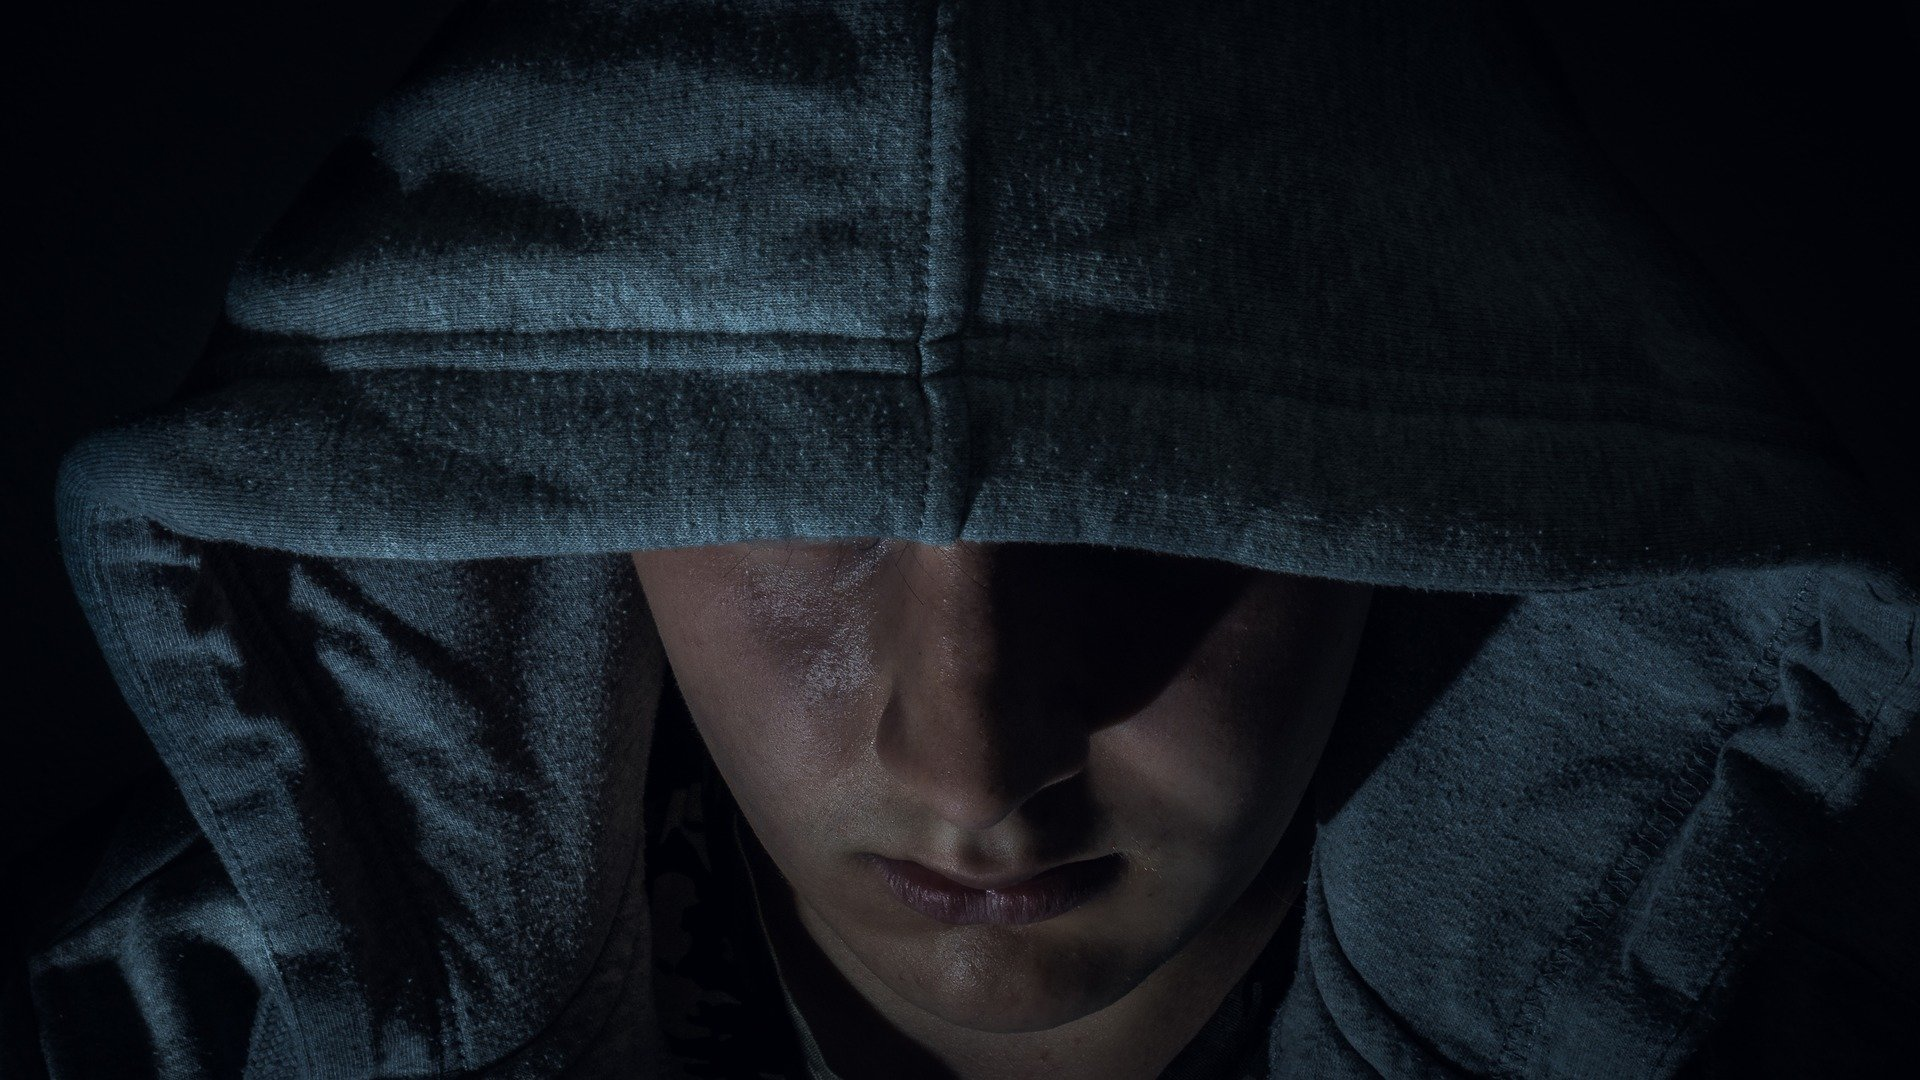 can brain lesions contribute to criminal behavior